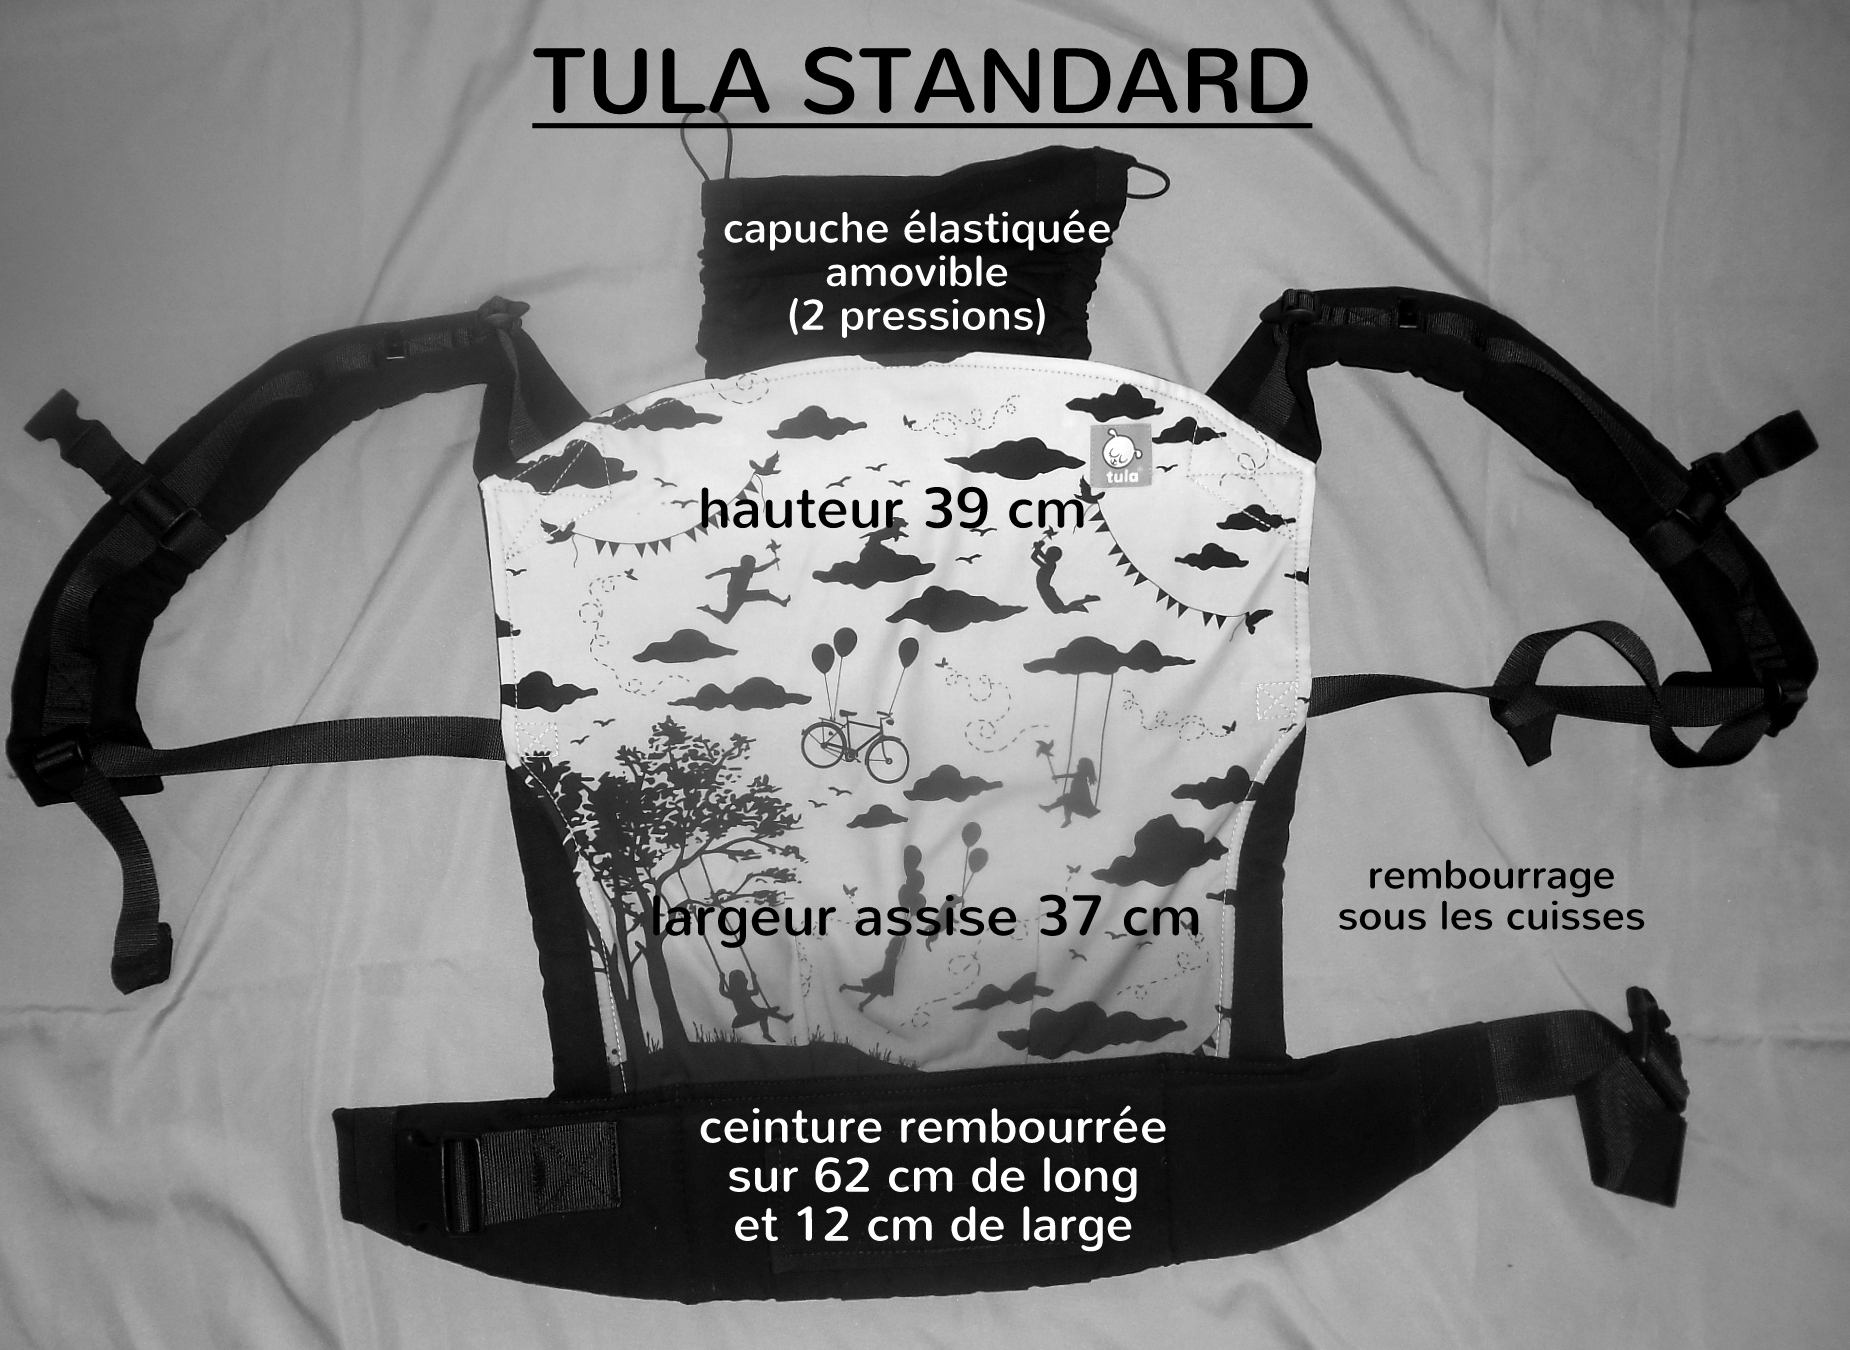 Tula standard babysize dimensions